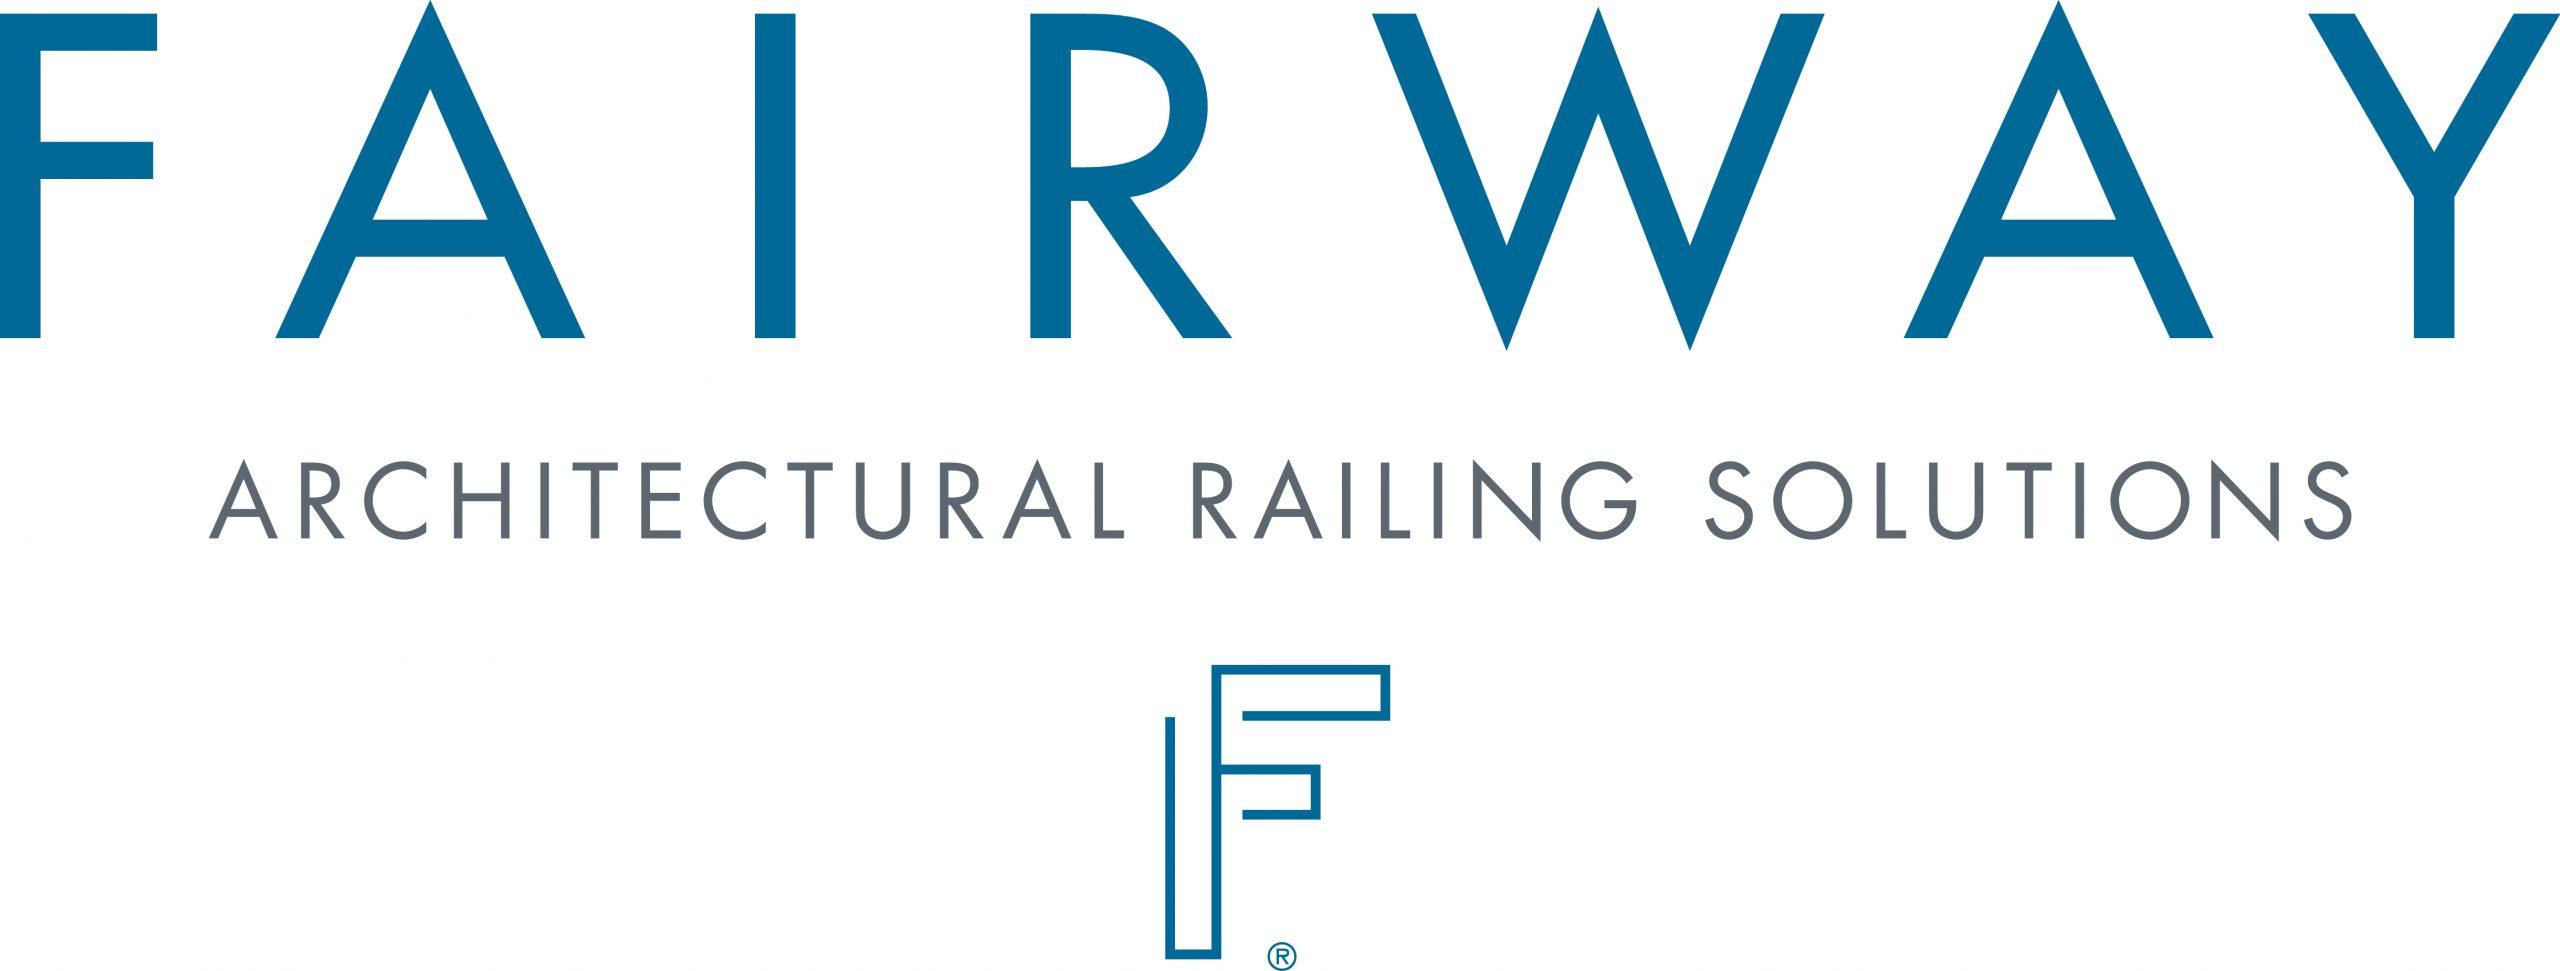 Fairway Logo scaled